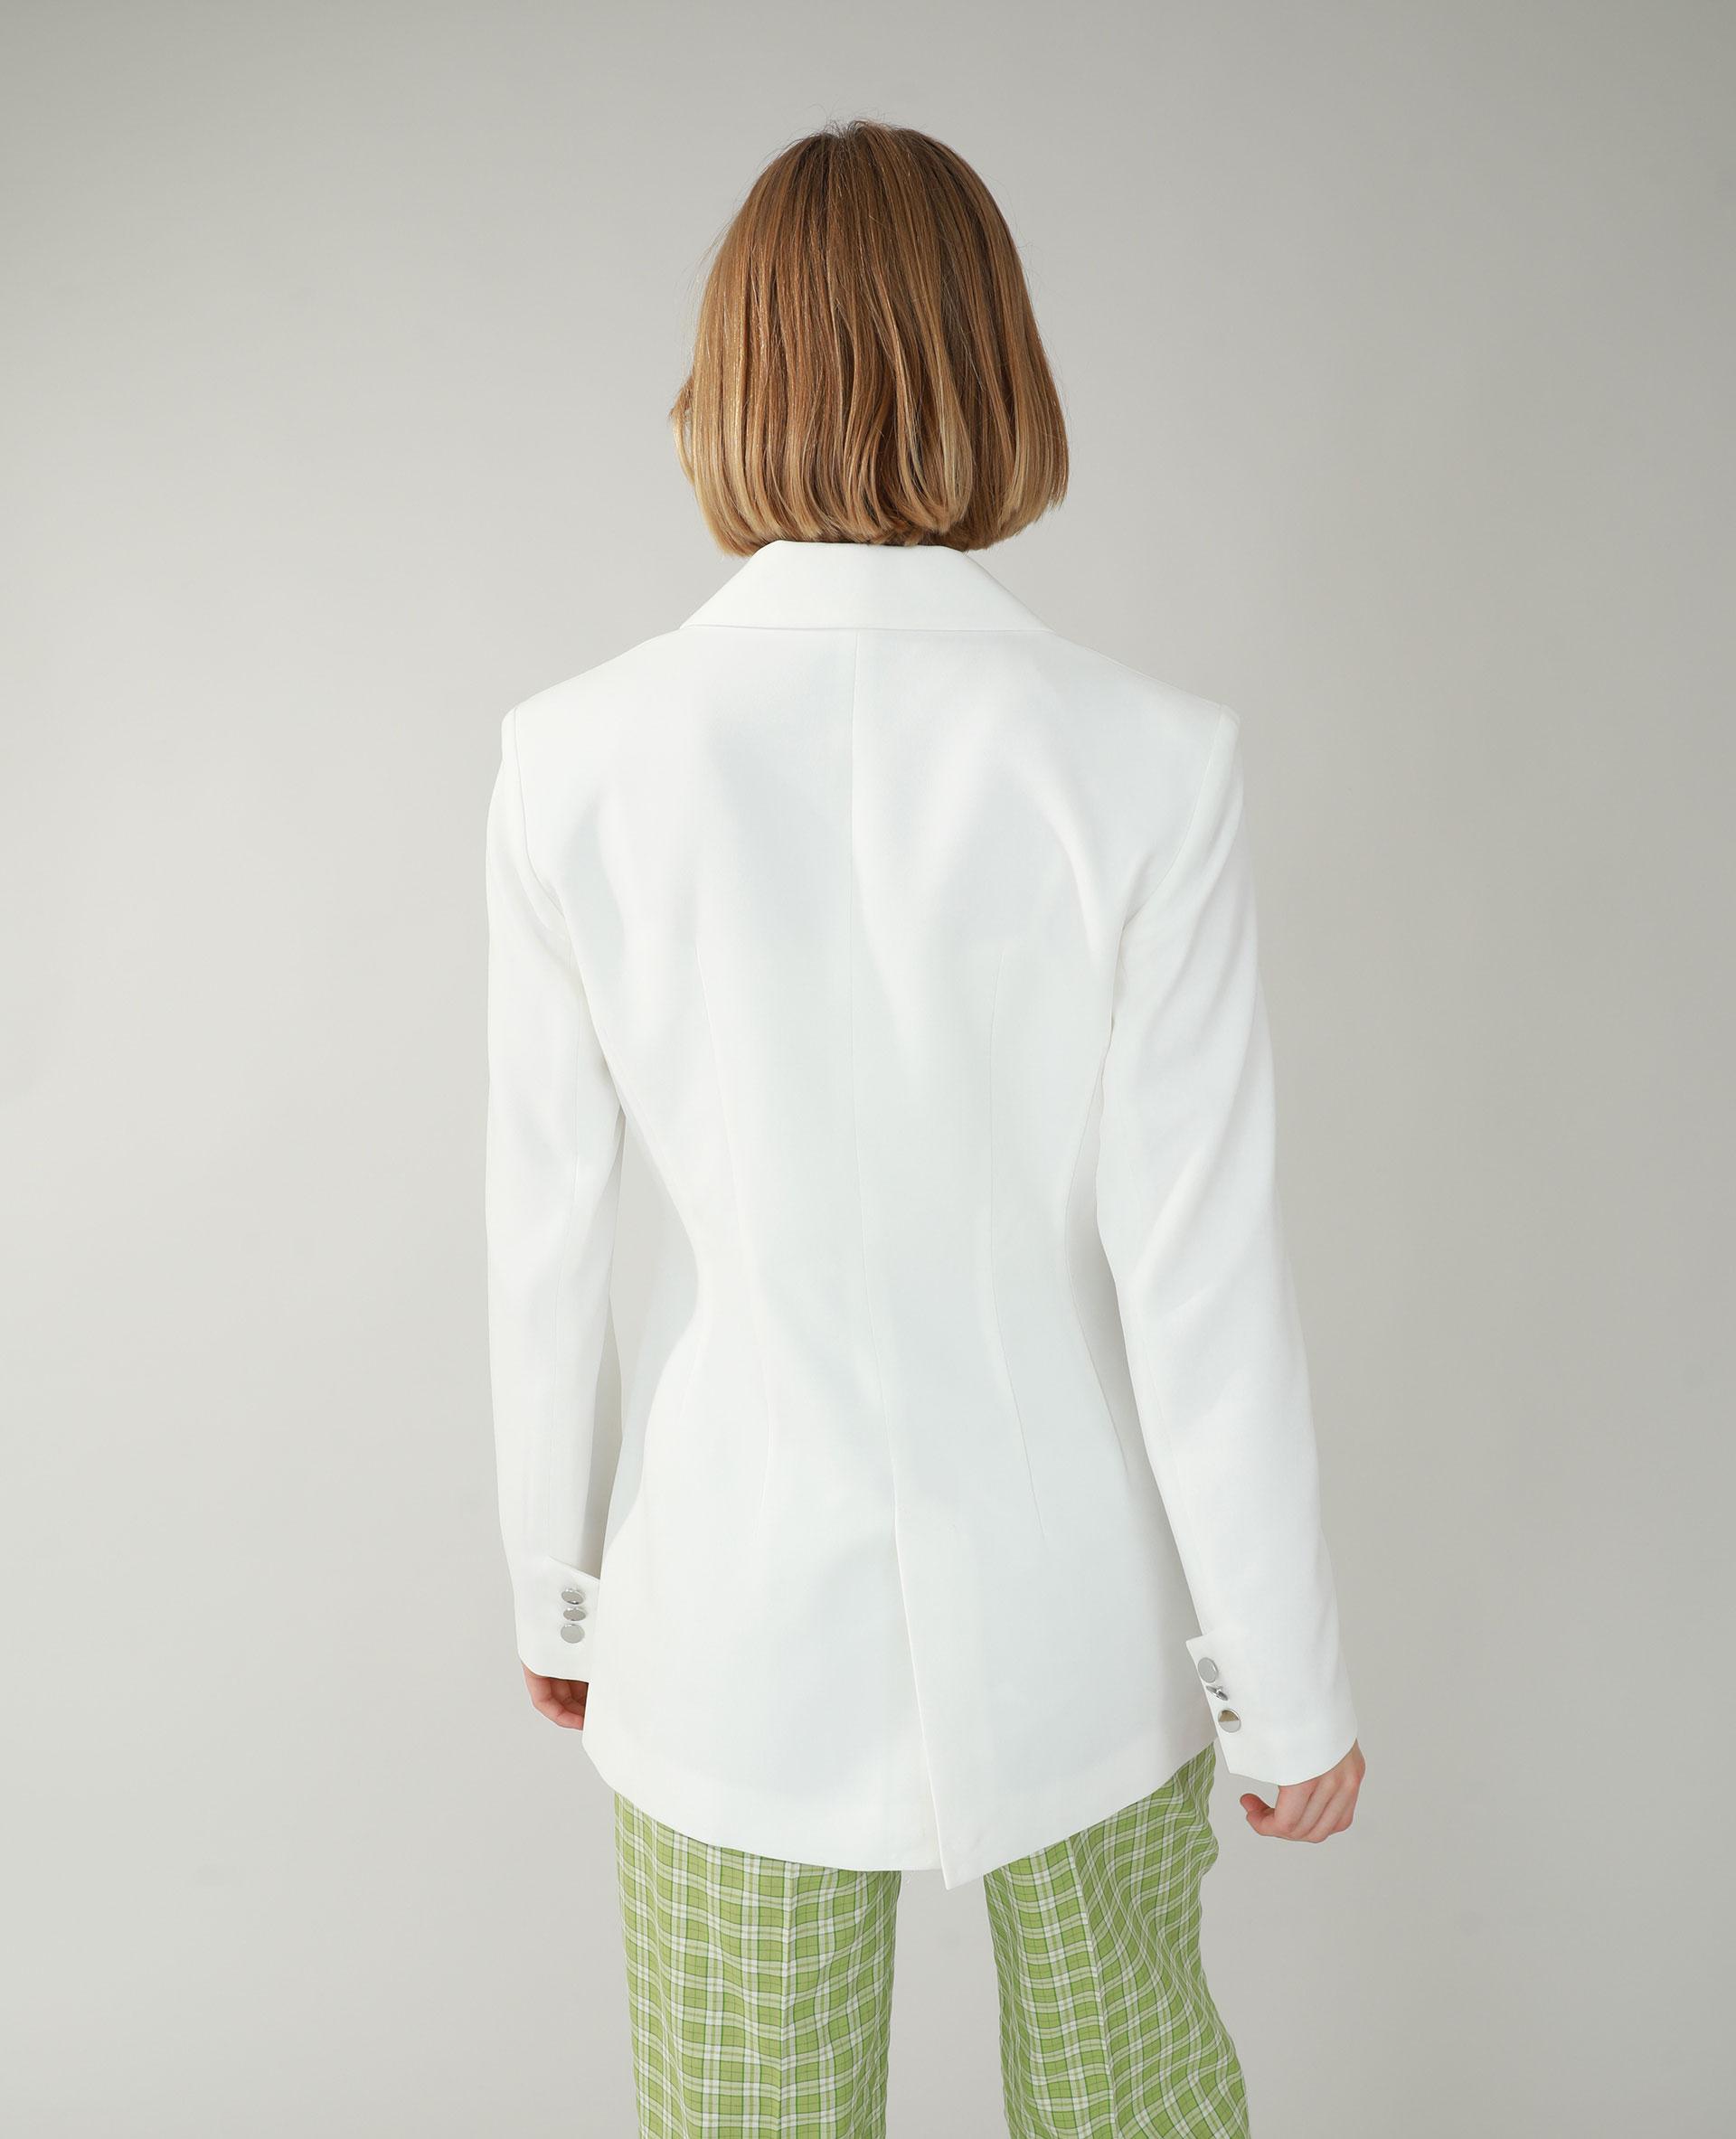 Veste longue blanc - Pimkie